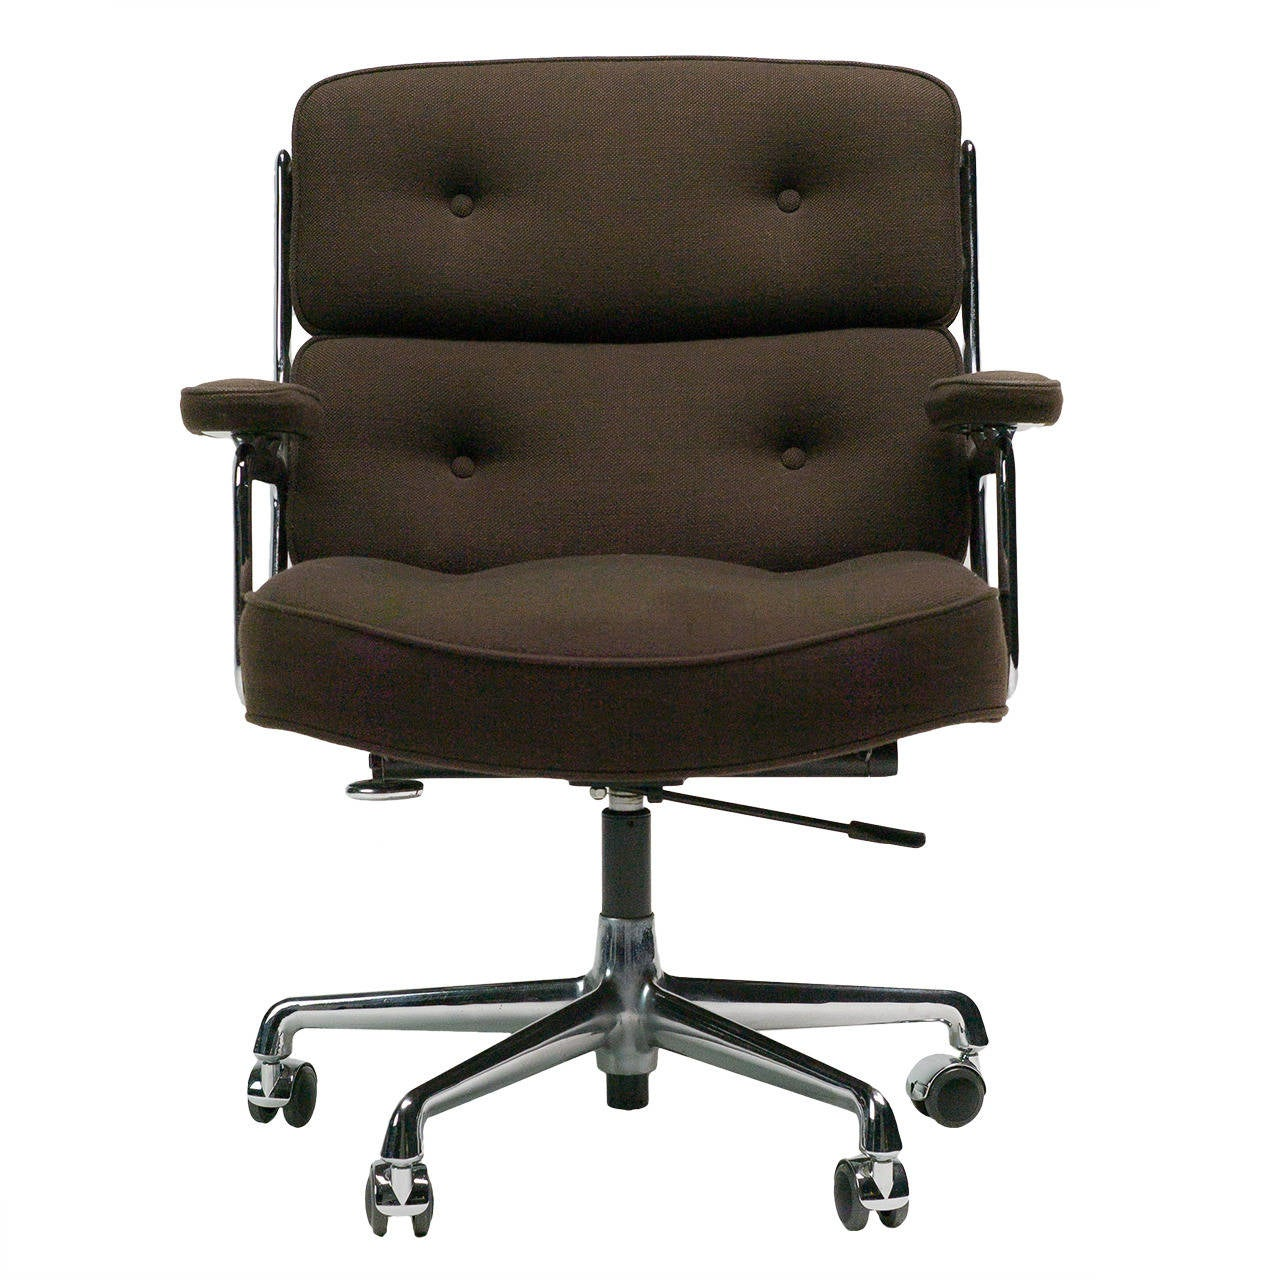 charles eames vitra es 104 lobby chair at 1stdibs. Black Bedroom Furniture Sets. Home Design Ideas